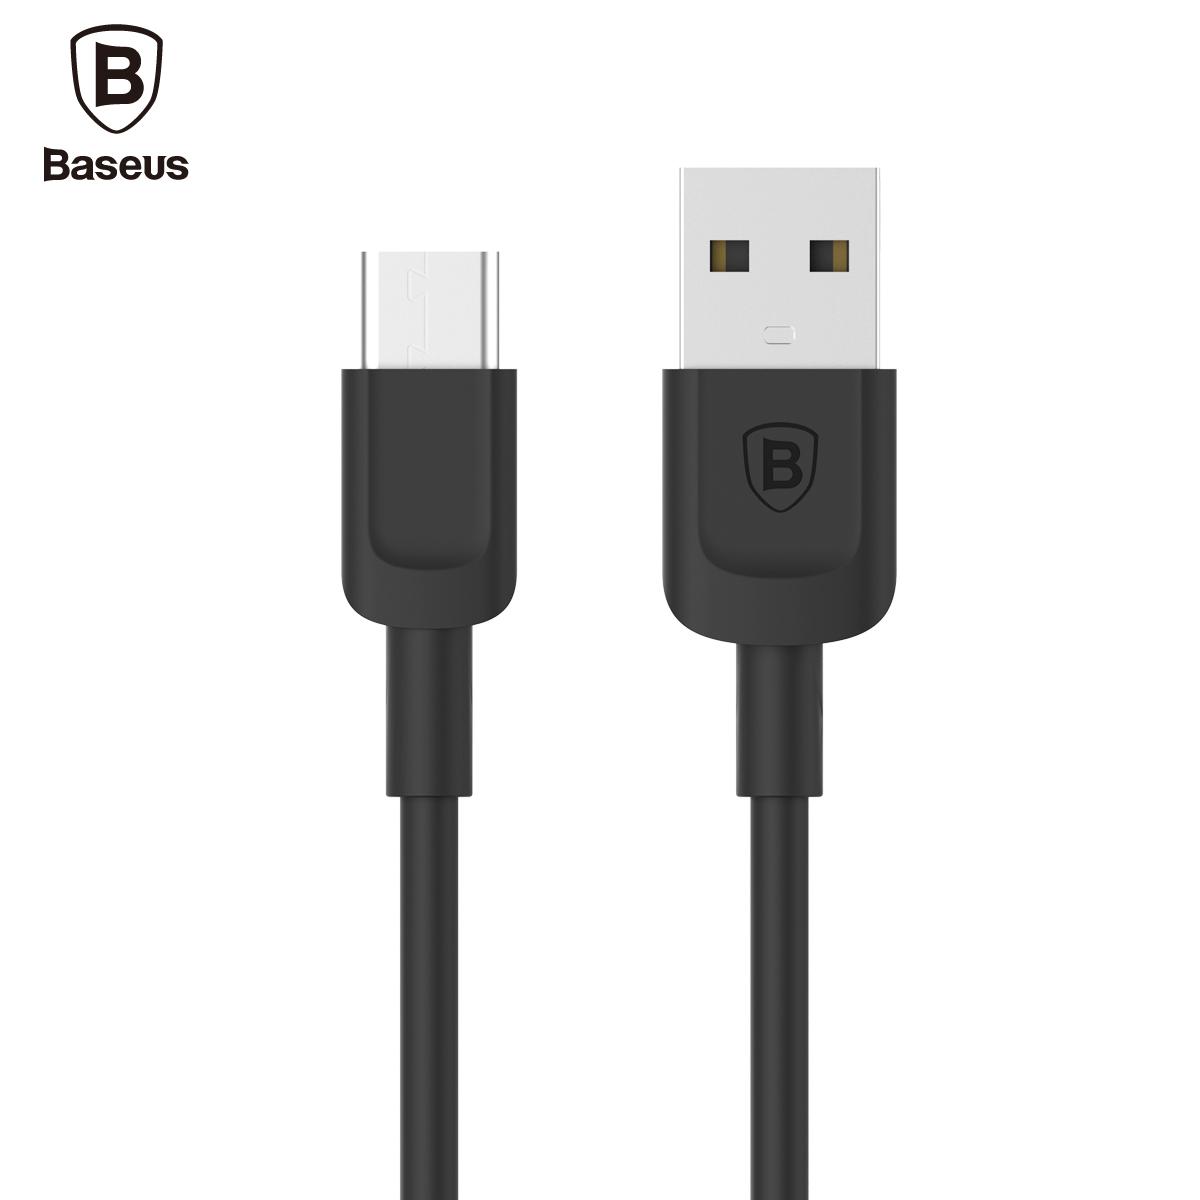 Baseus USB Type C Cable For Xiaomi Mi5 Mi4c LG Nexus 5X 6P Meizu pro 5 Oneplus 3 2 Fast Data USB Charger USB C 3.1 Type-C Cable